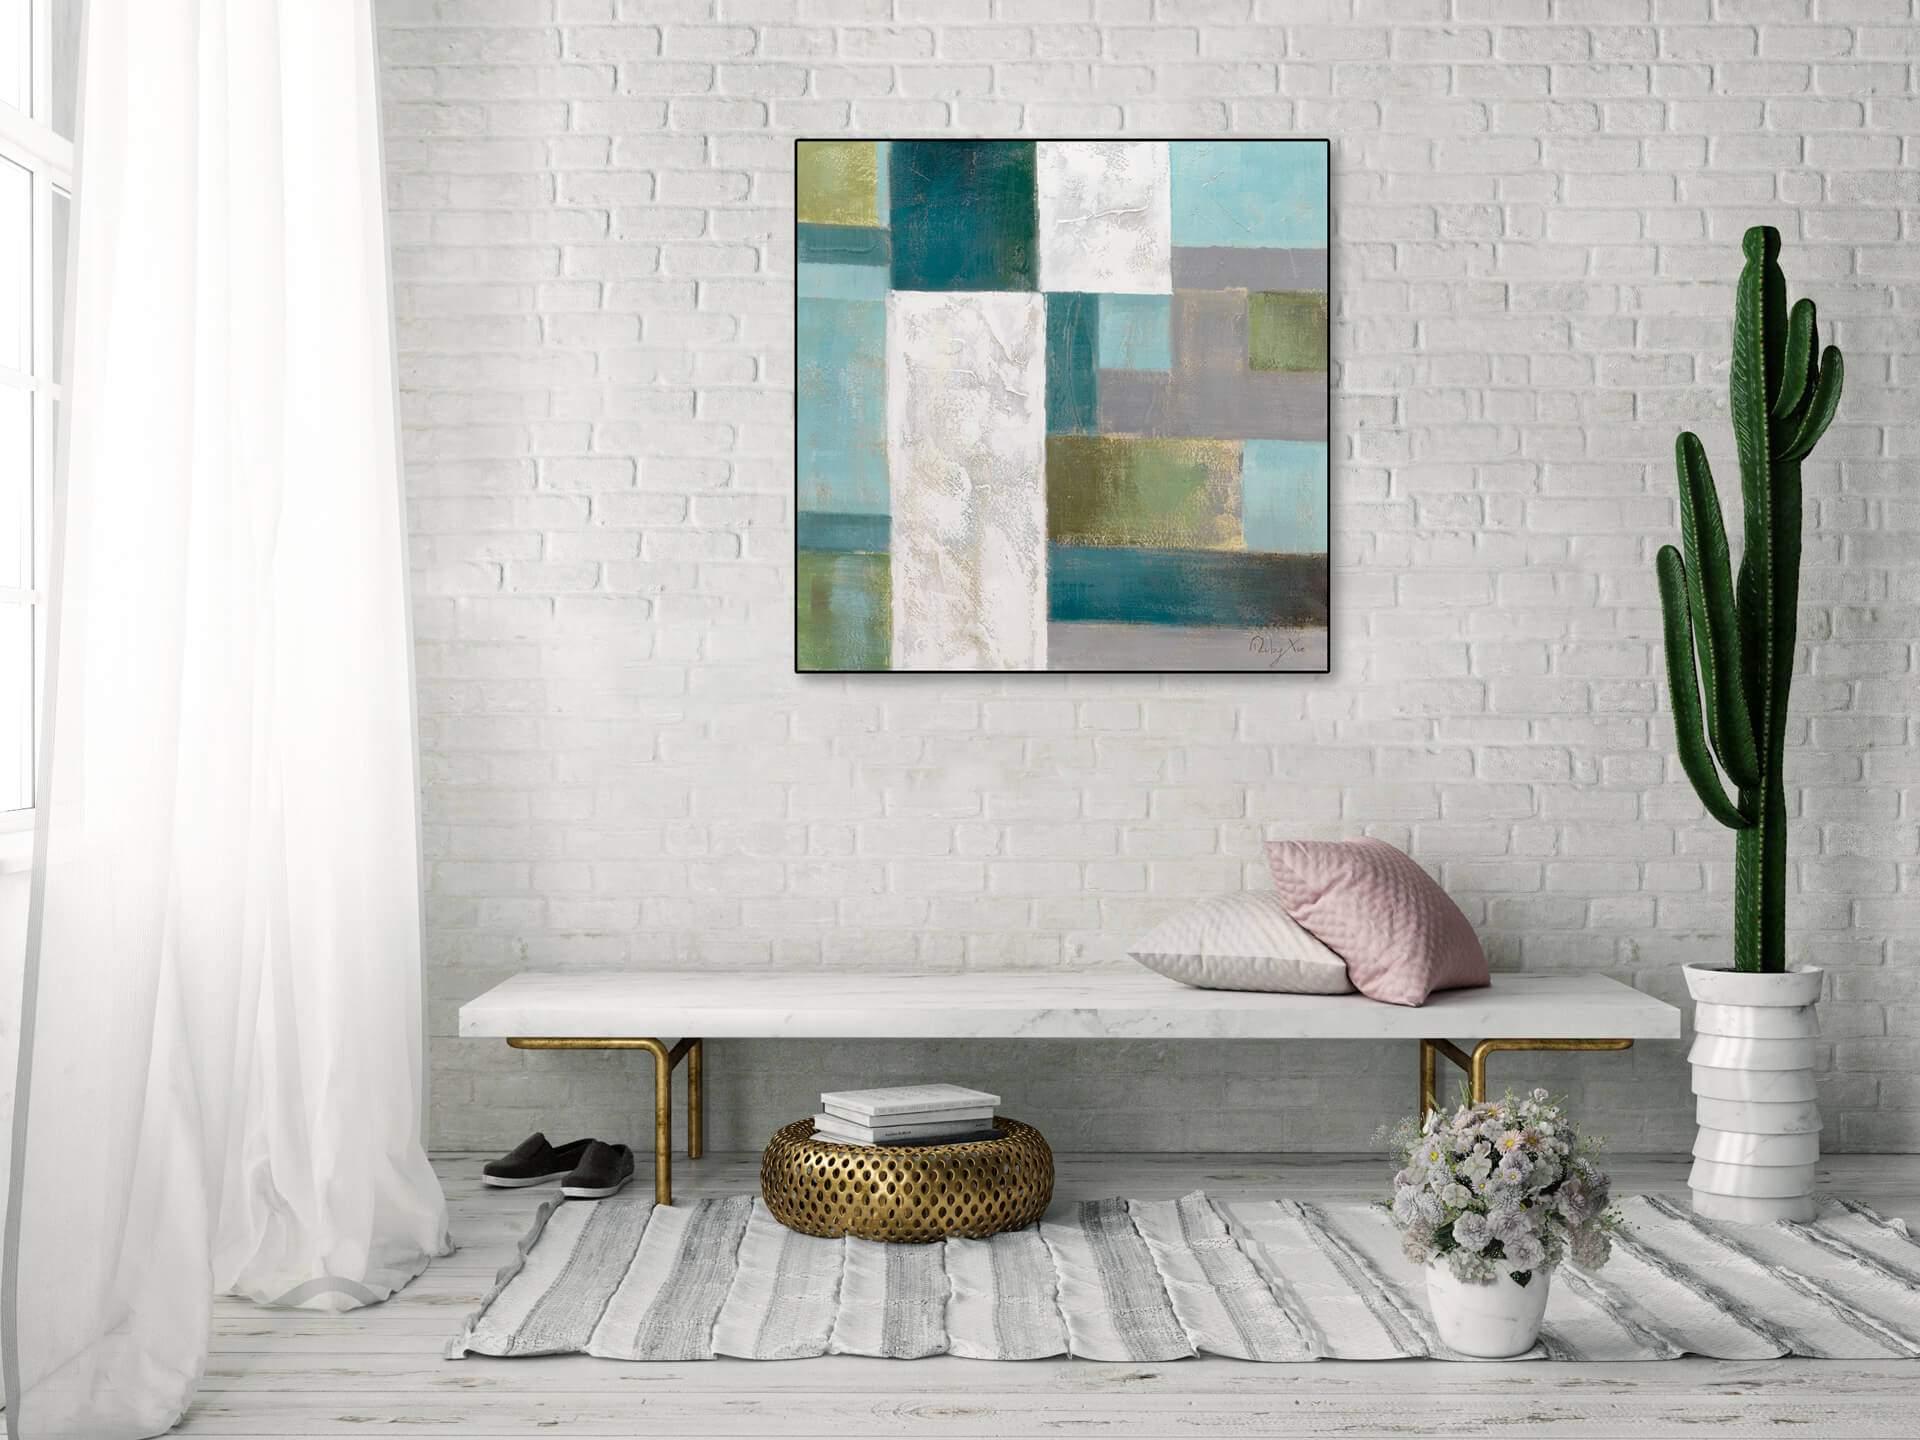 KL modern quadrate modern acryl gemaelde oel bild oelgemaelde 05